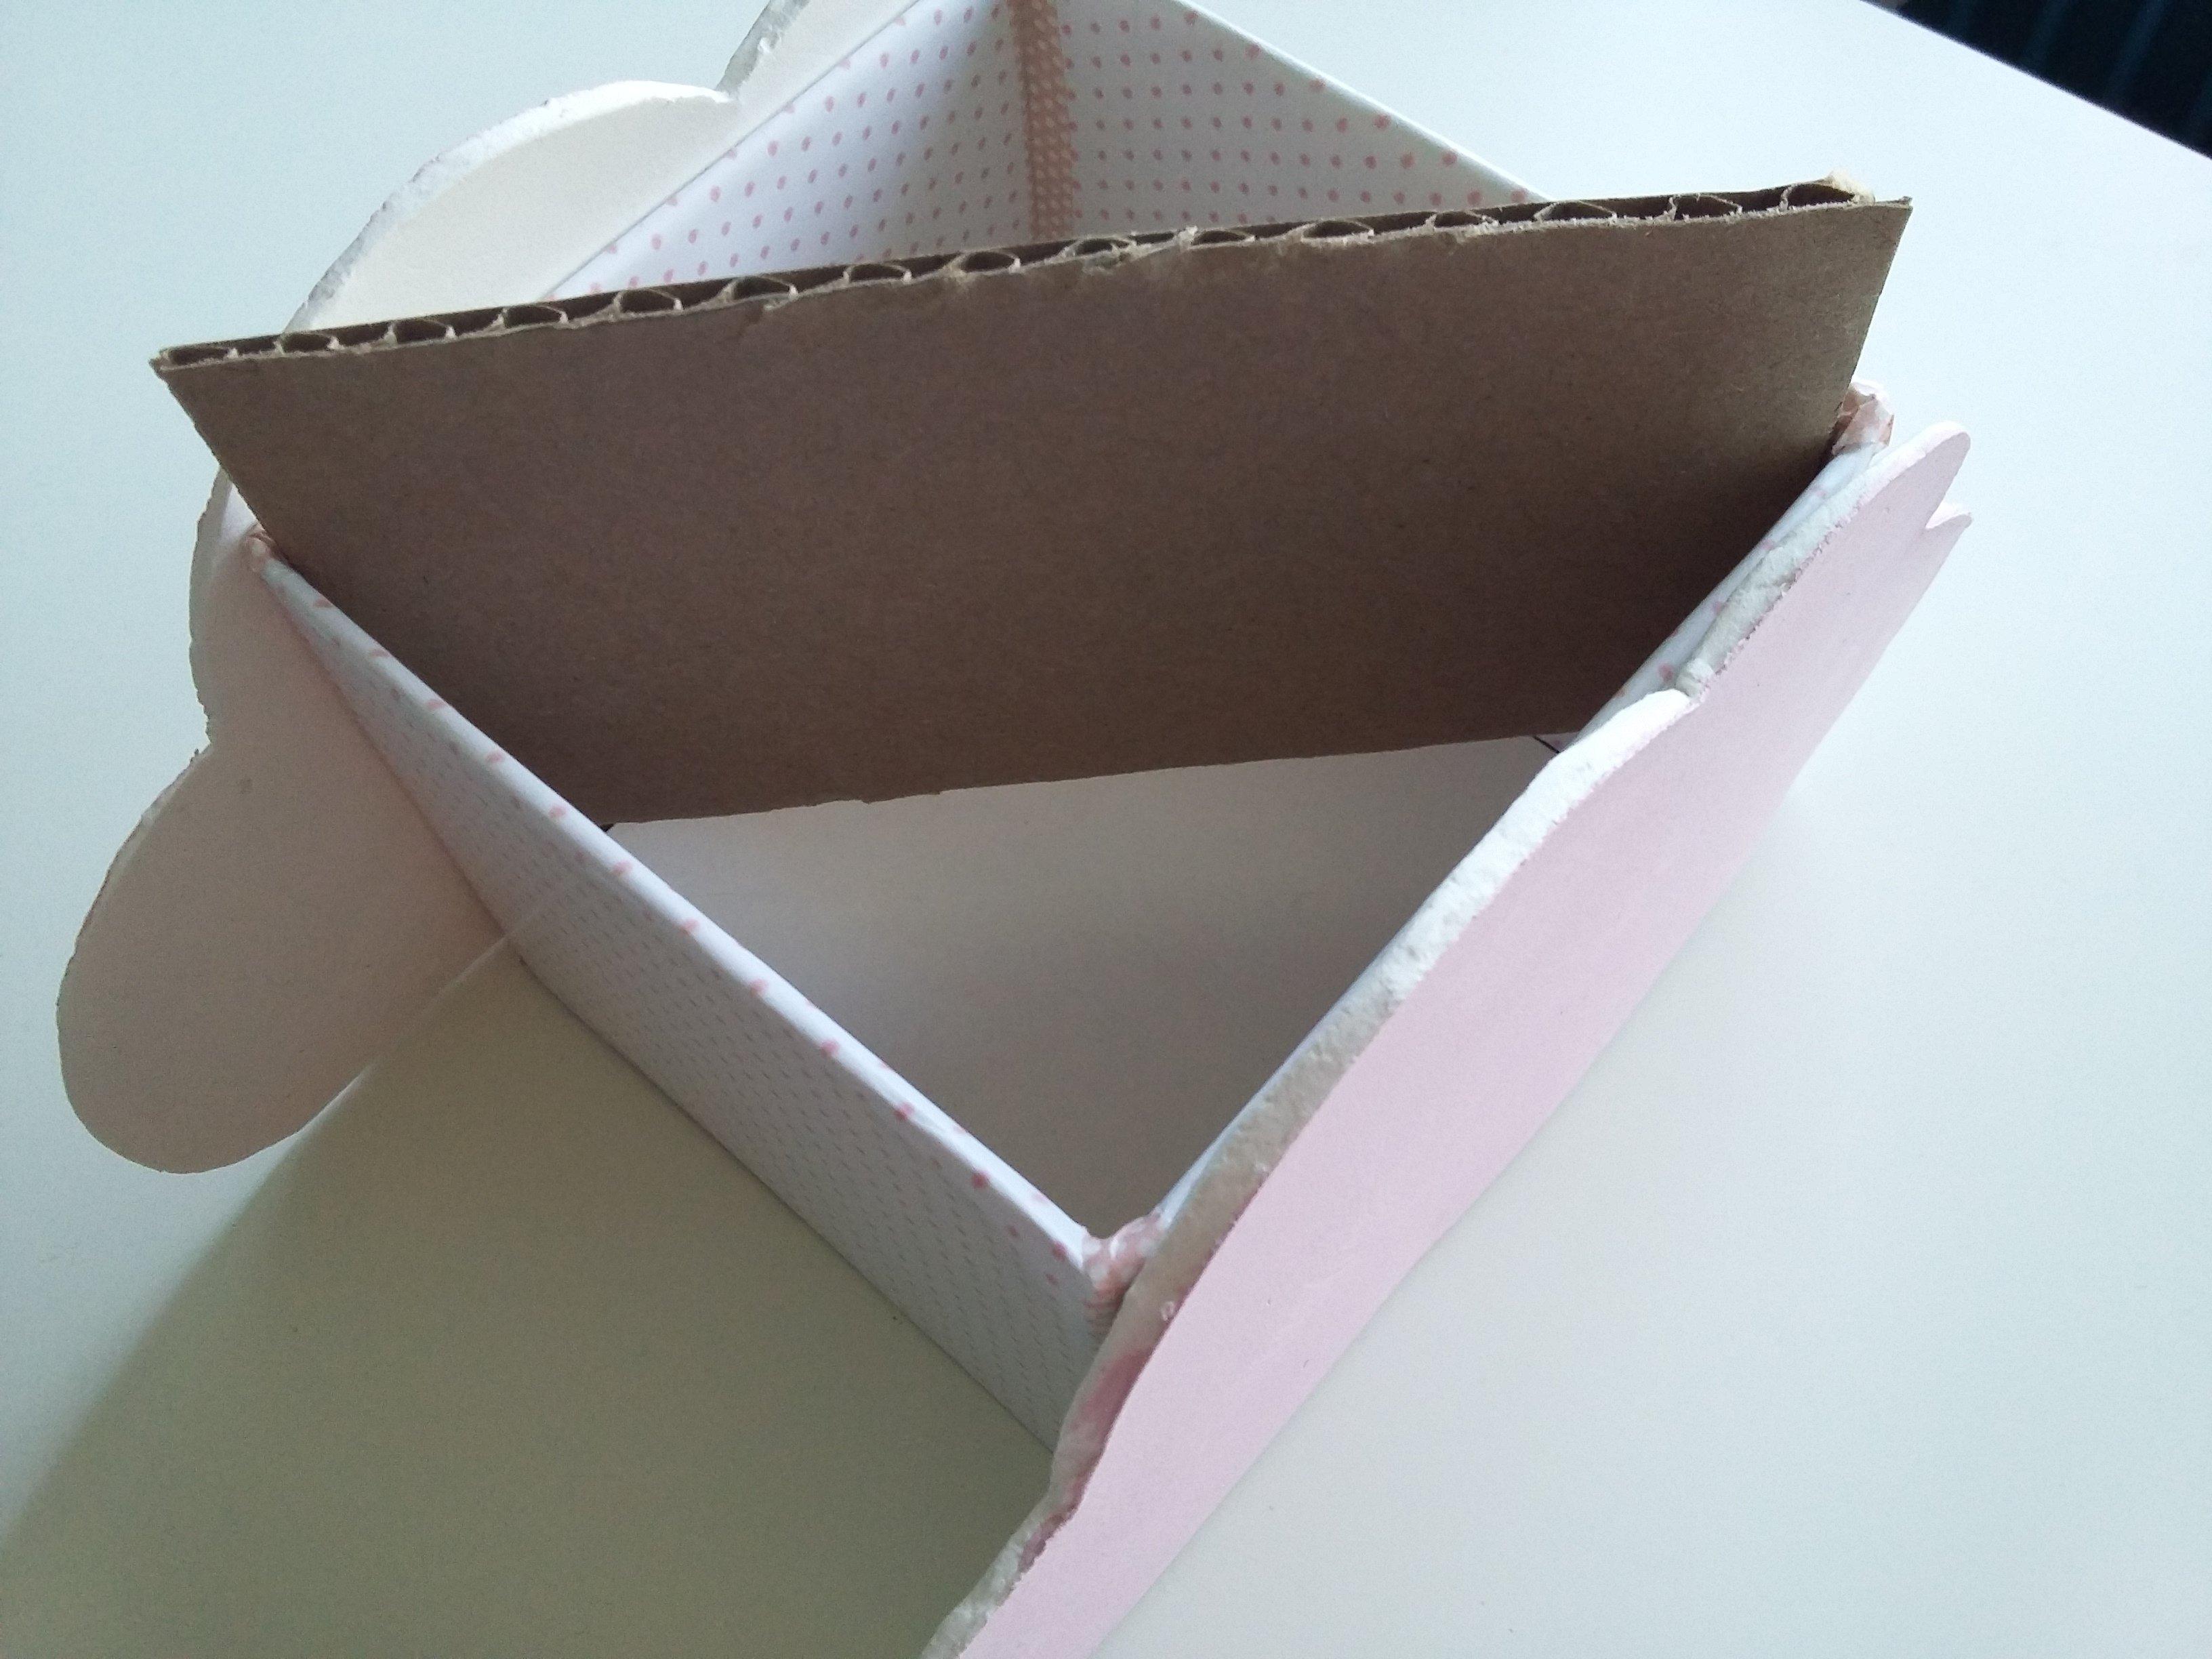 Bullesdeplume potnuage carton de s%c3%a9paration